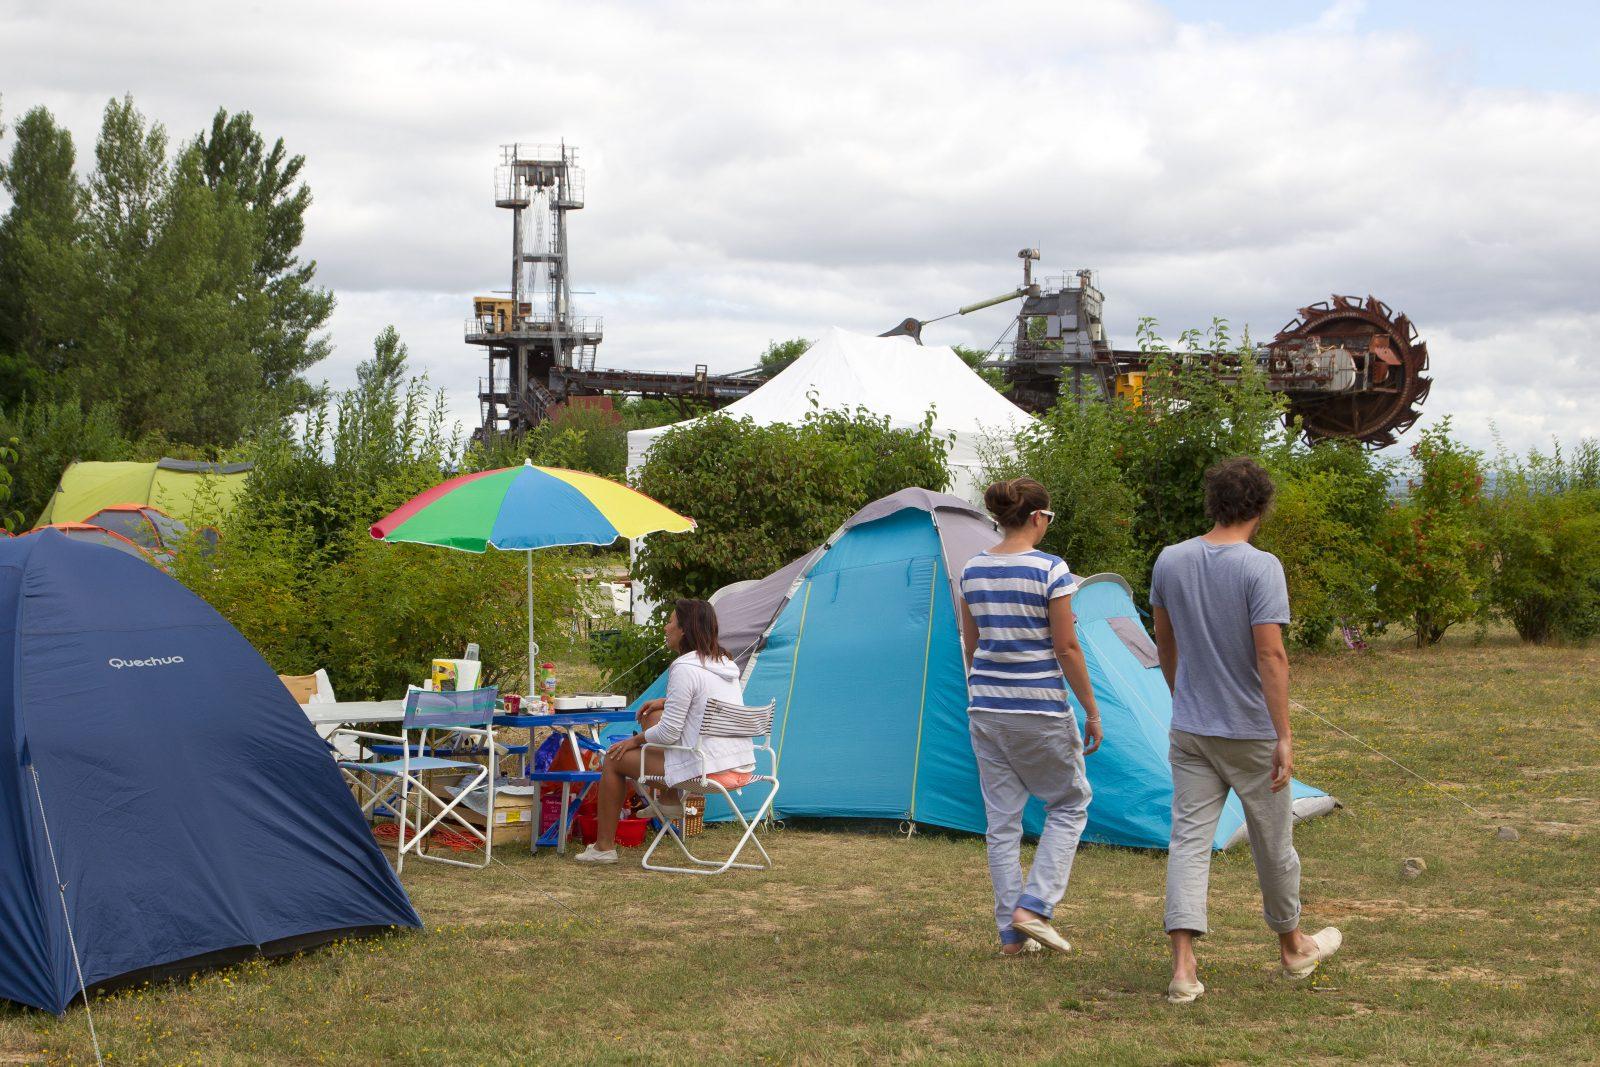 Camping du lac Ste Marie